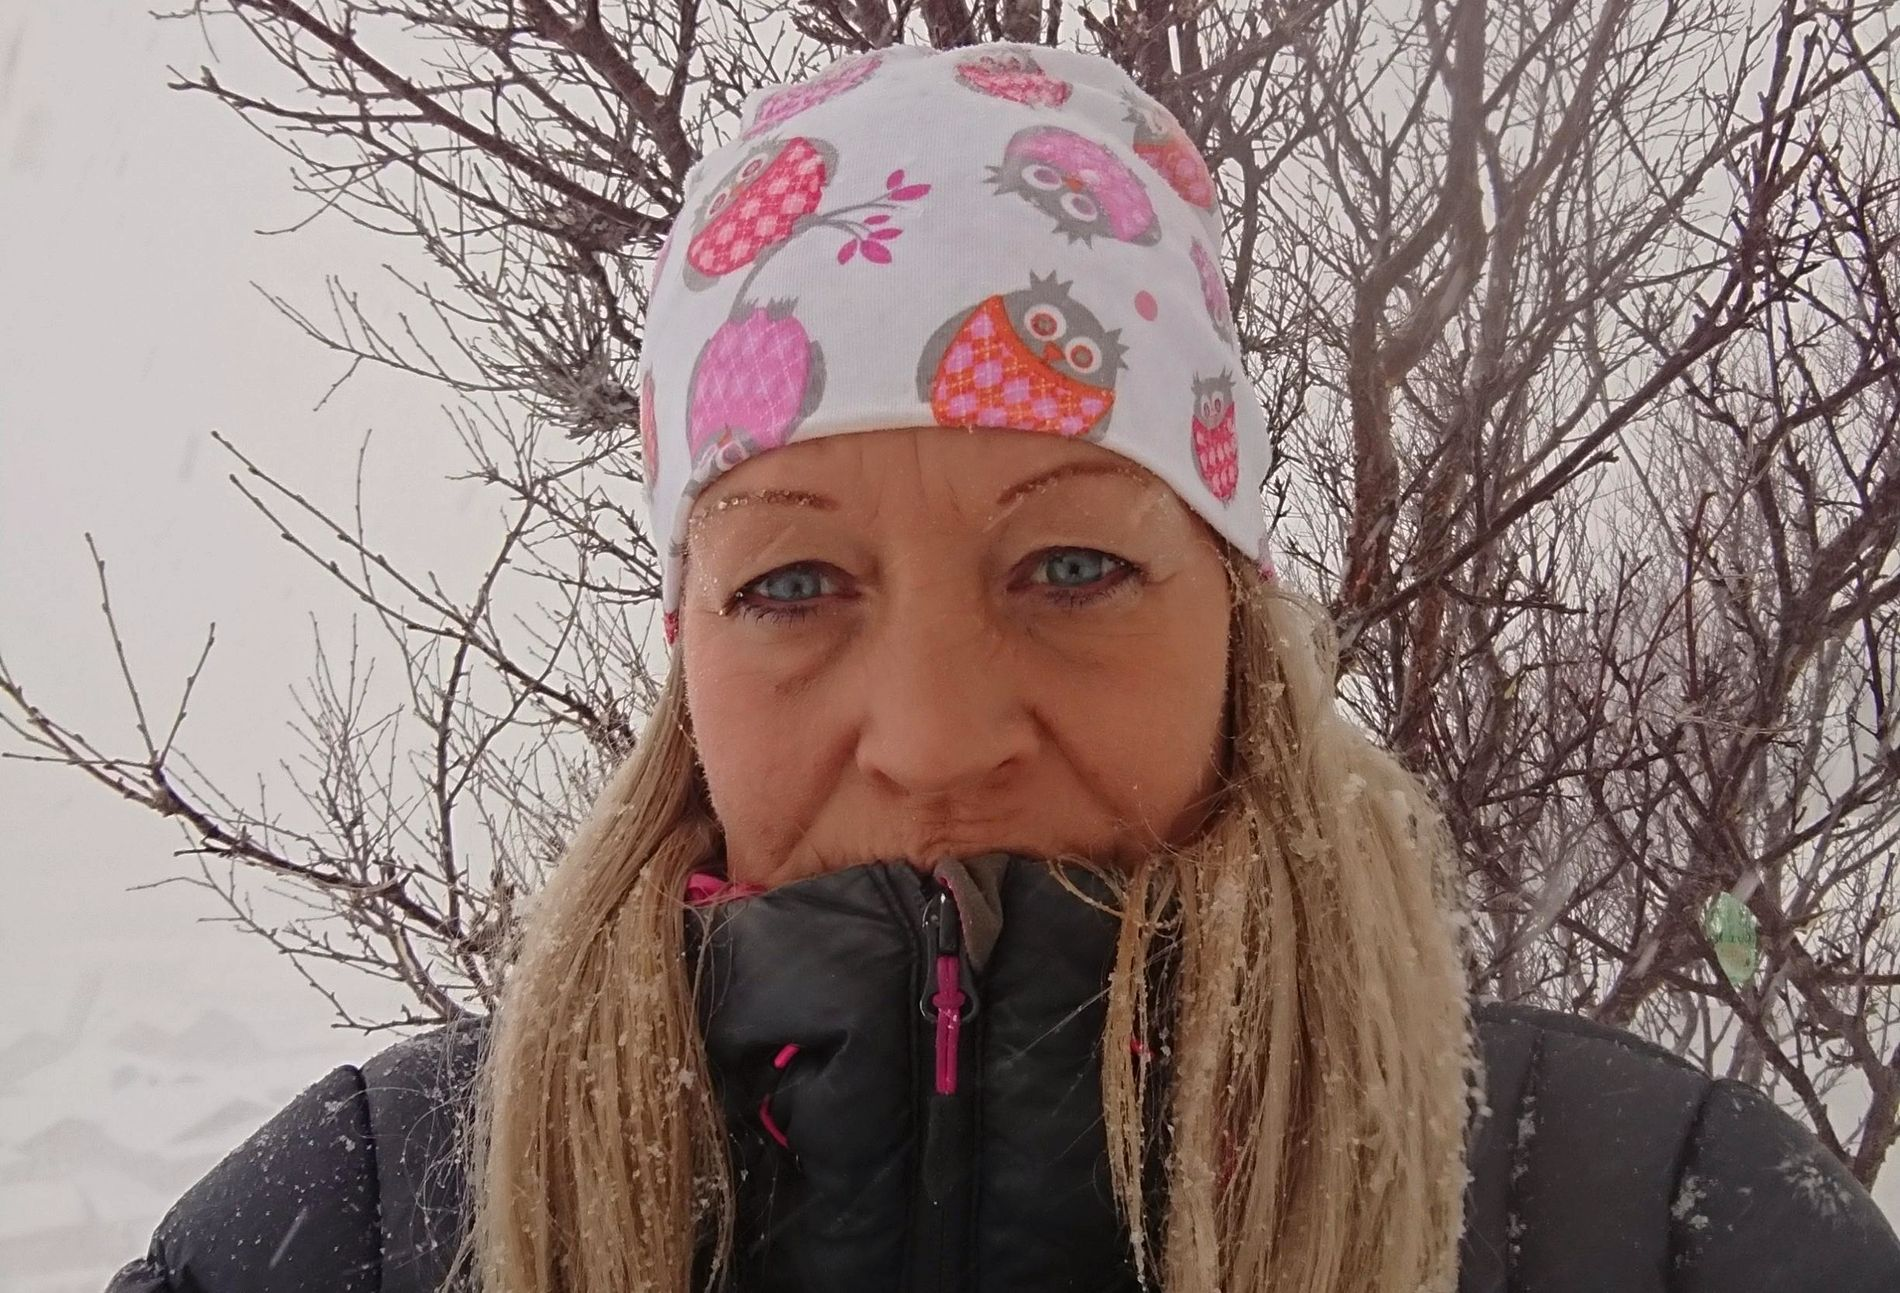 PÅSKEHARE: Signe Helene Østrevik ofret påskeegget sitt til en strandet trailersjåfør i år.